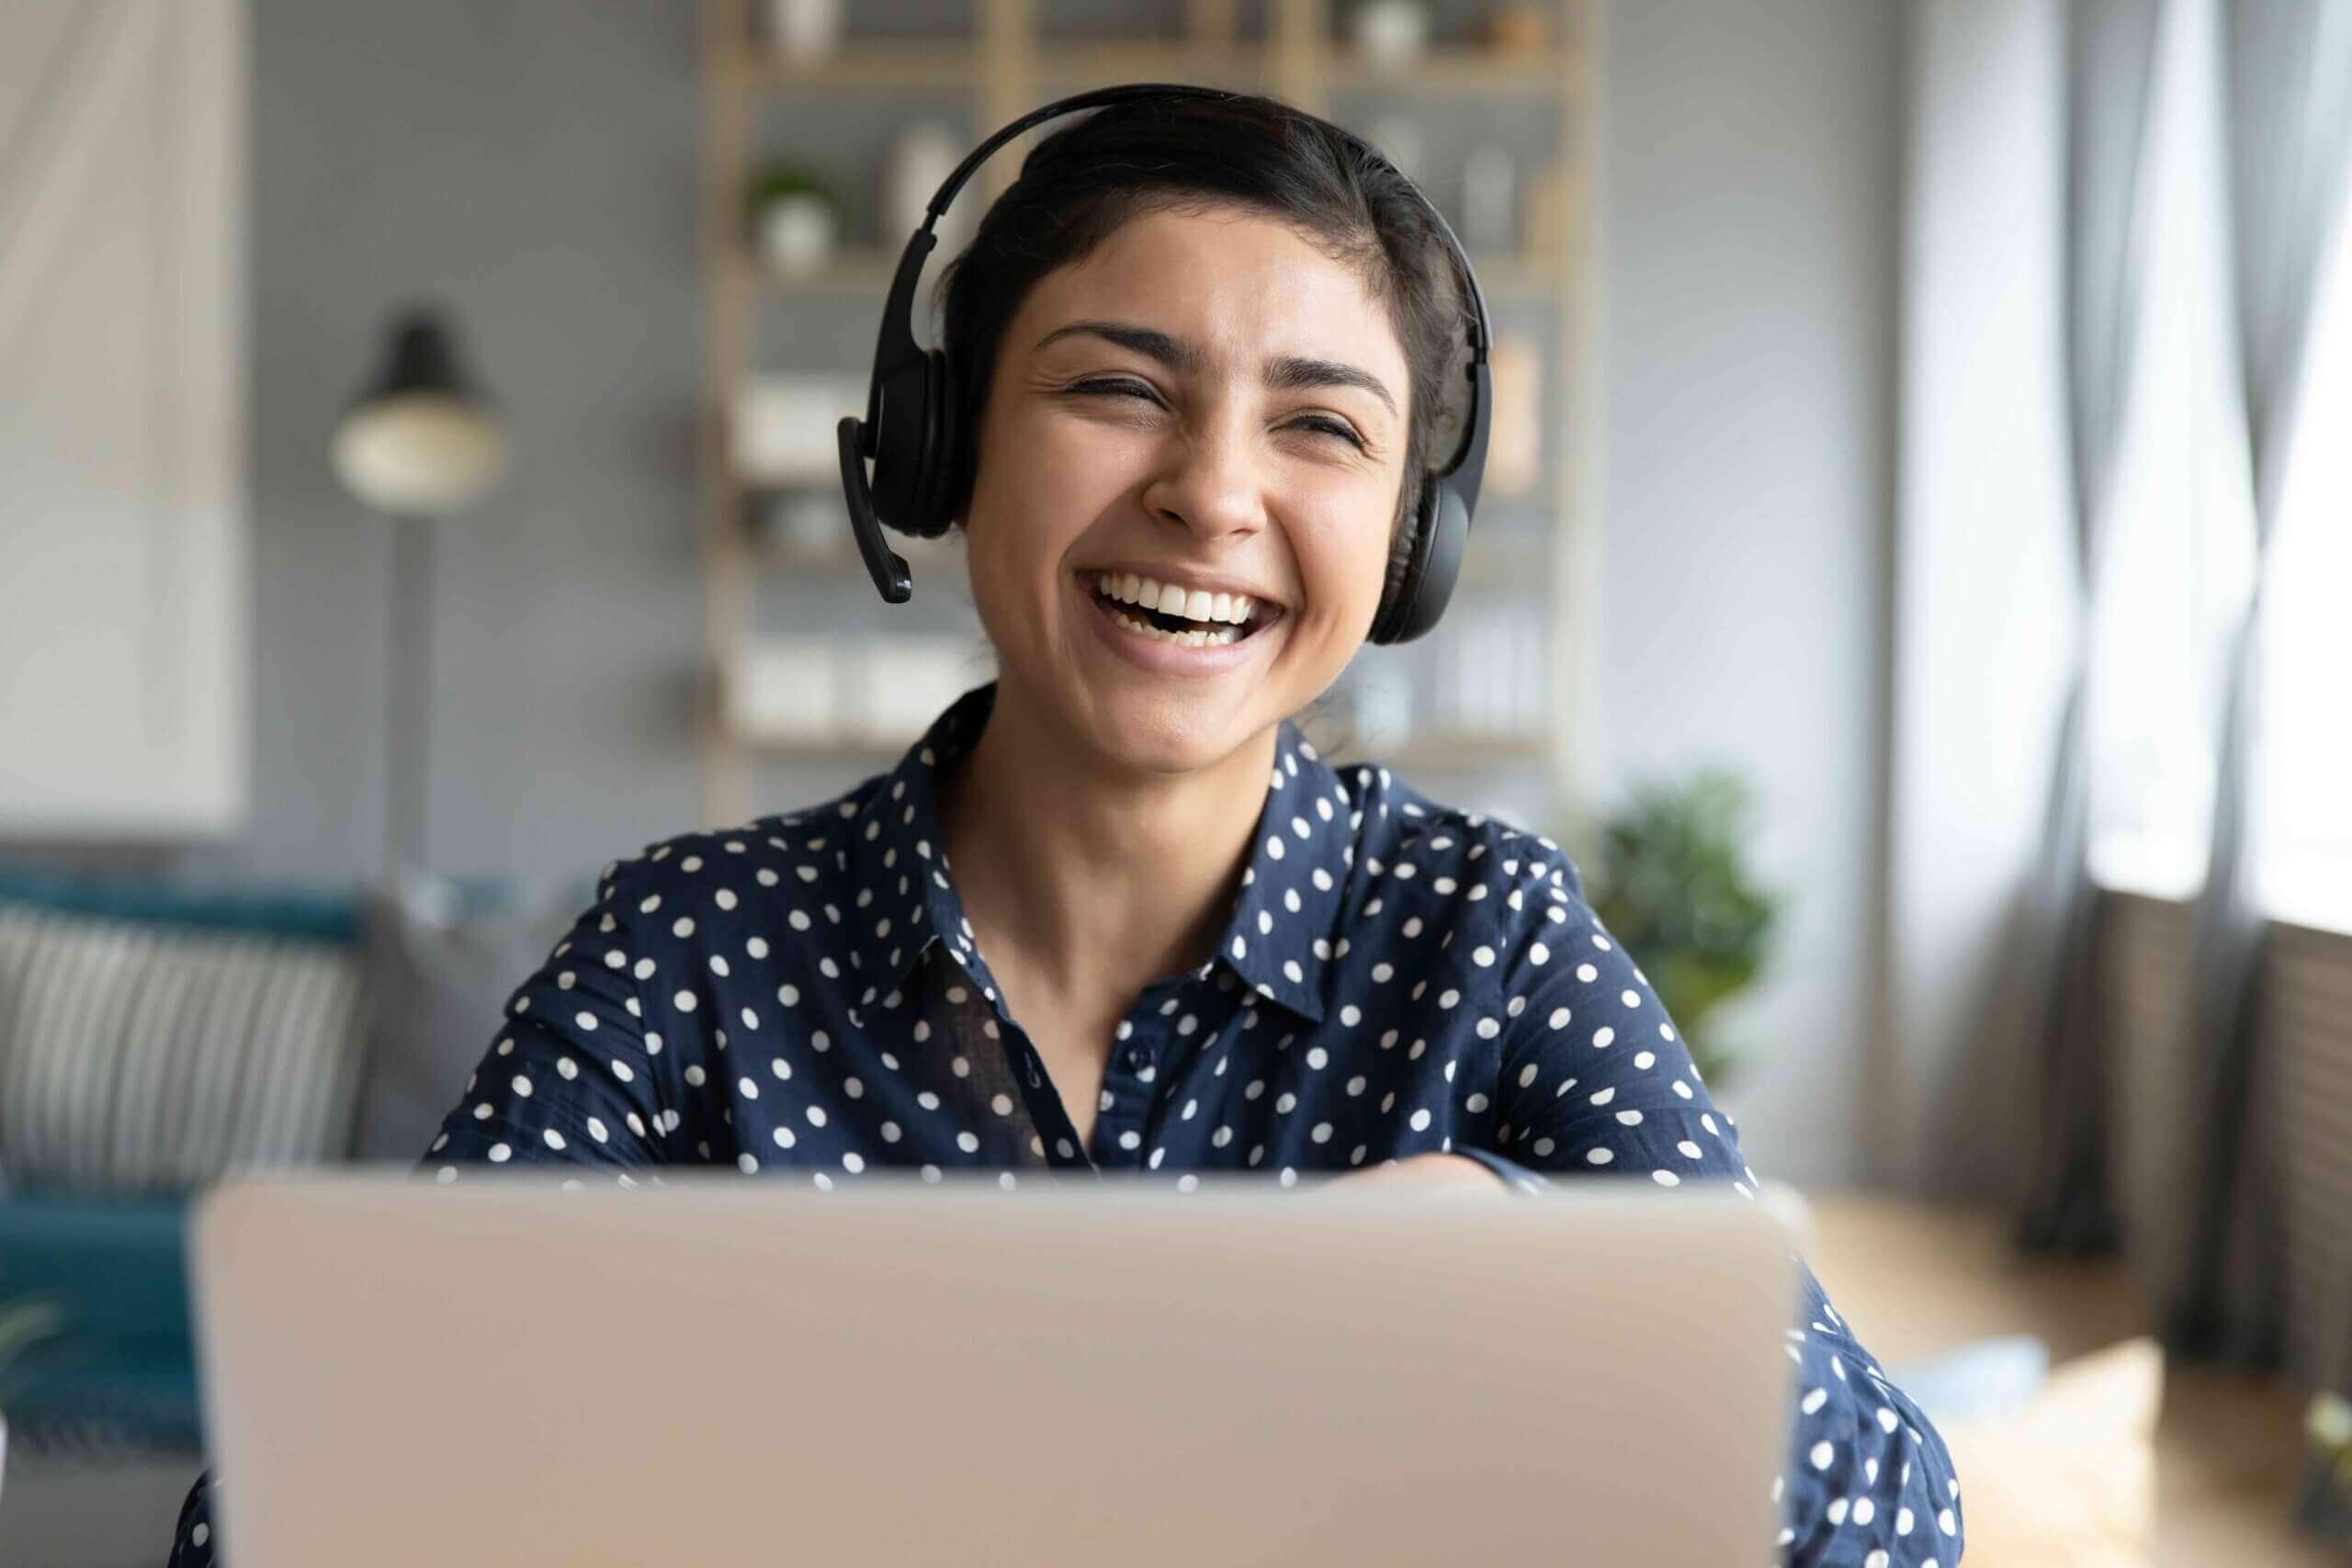 Virtual job interviewing